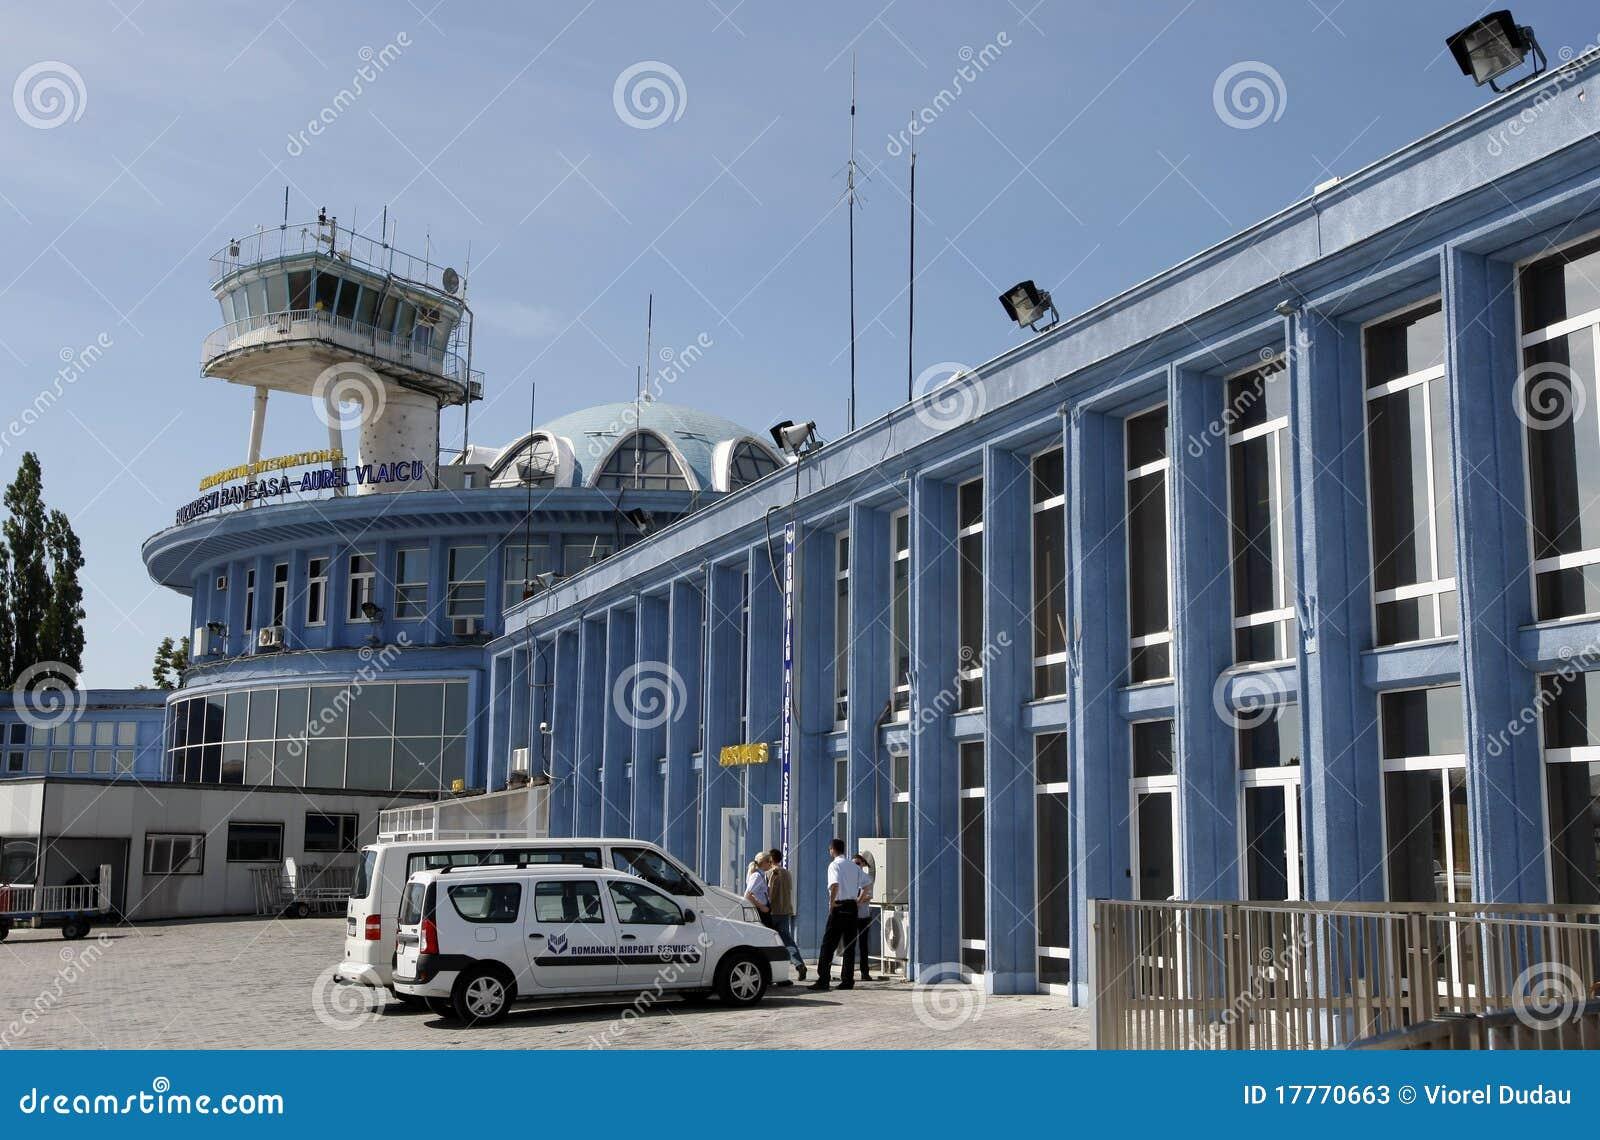 Aeroporto Romania : Bucharest baneasa airport aurel vlaicu editorial stock